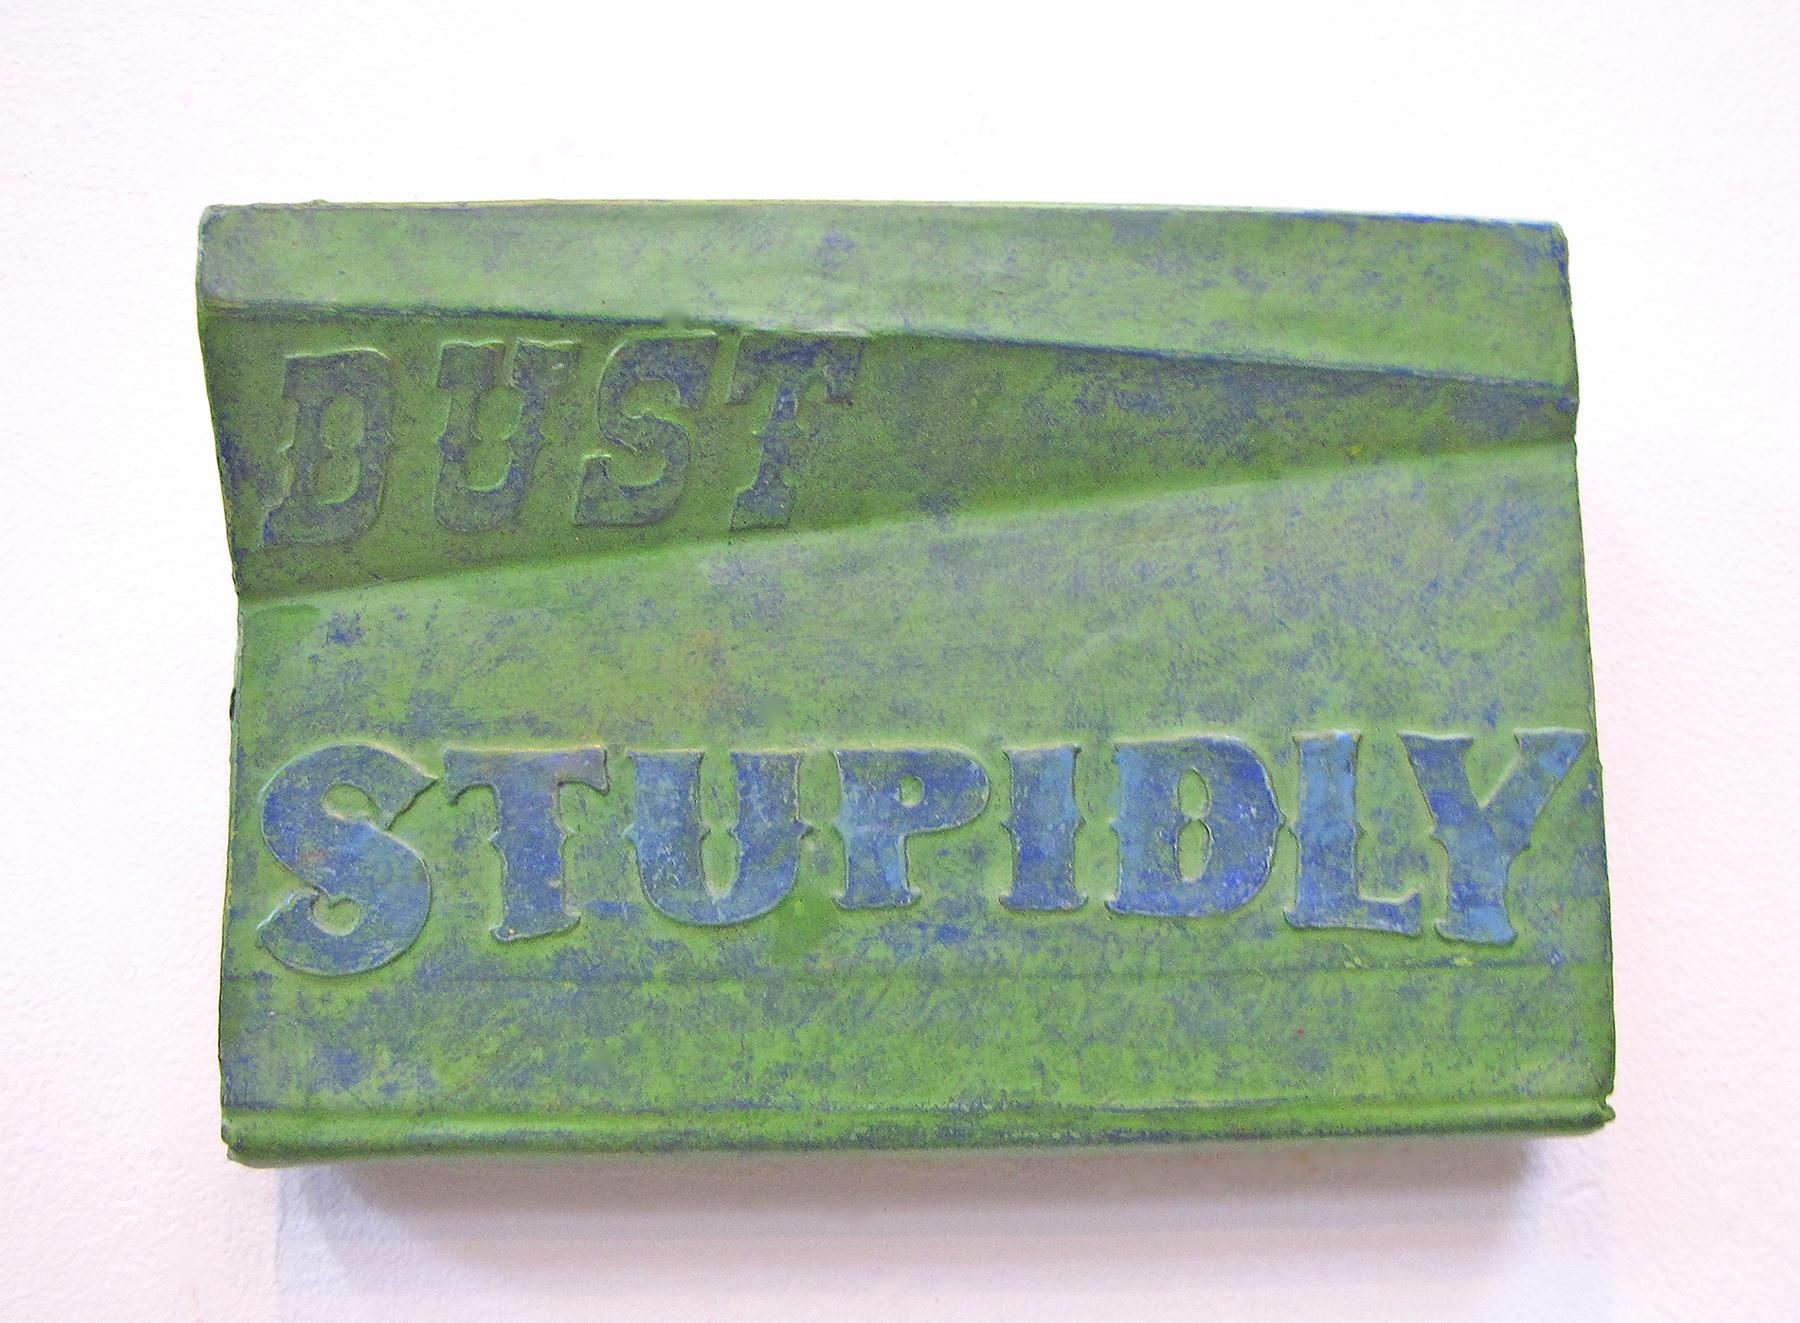 Exhortations 2: dust stupidly